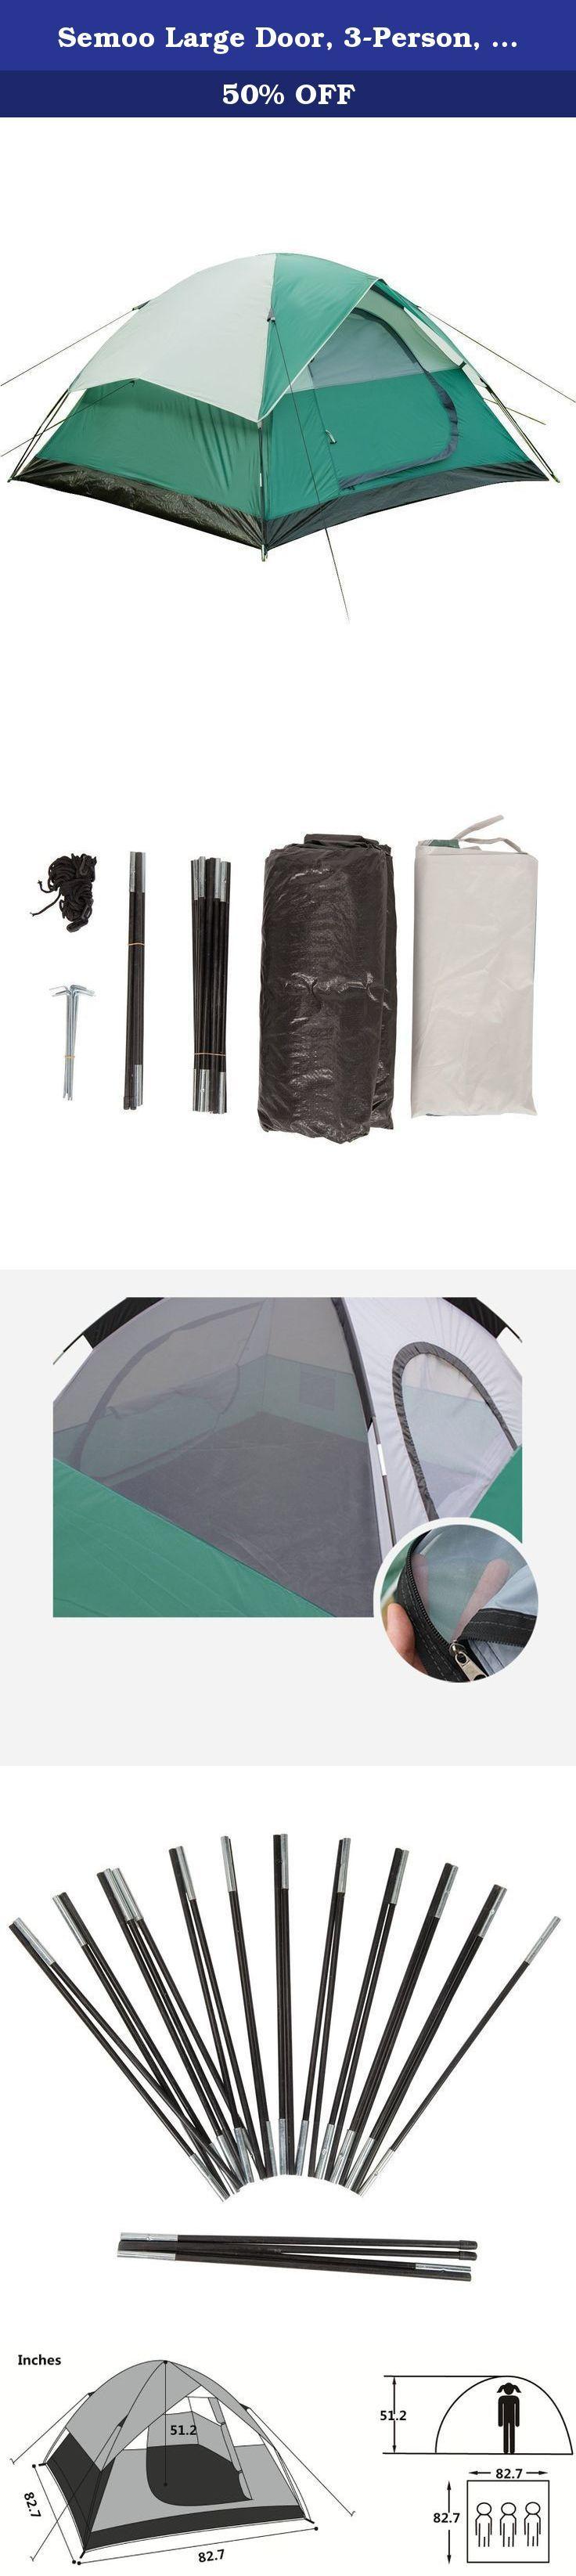 Semoo large door 3 person 3 season lightweight water resistant family camping